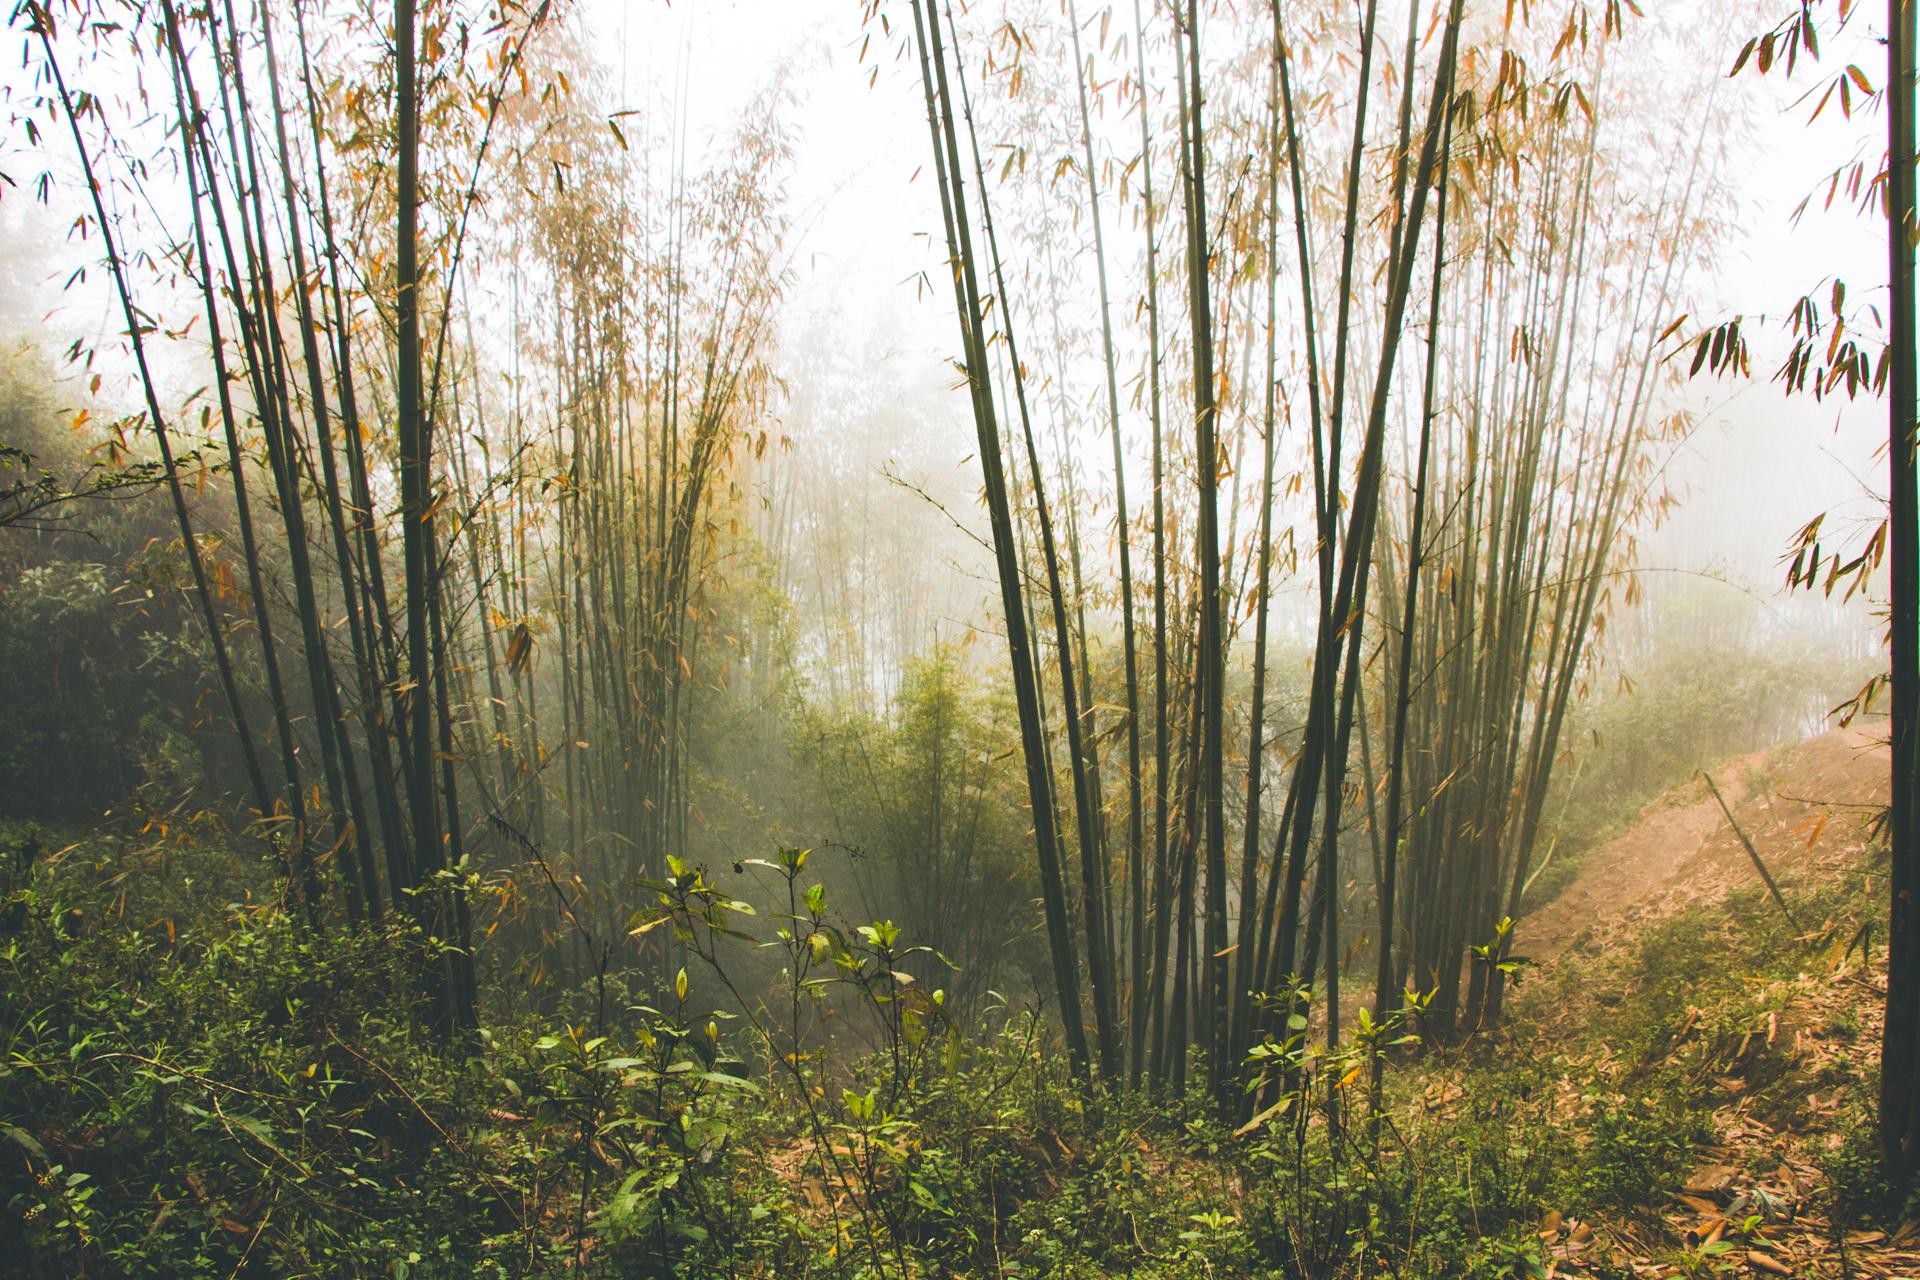 Bamboo forest Sapa